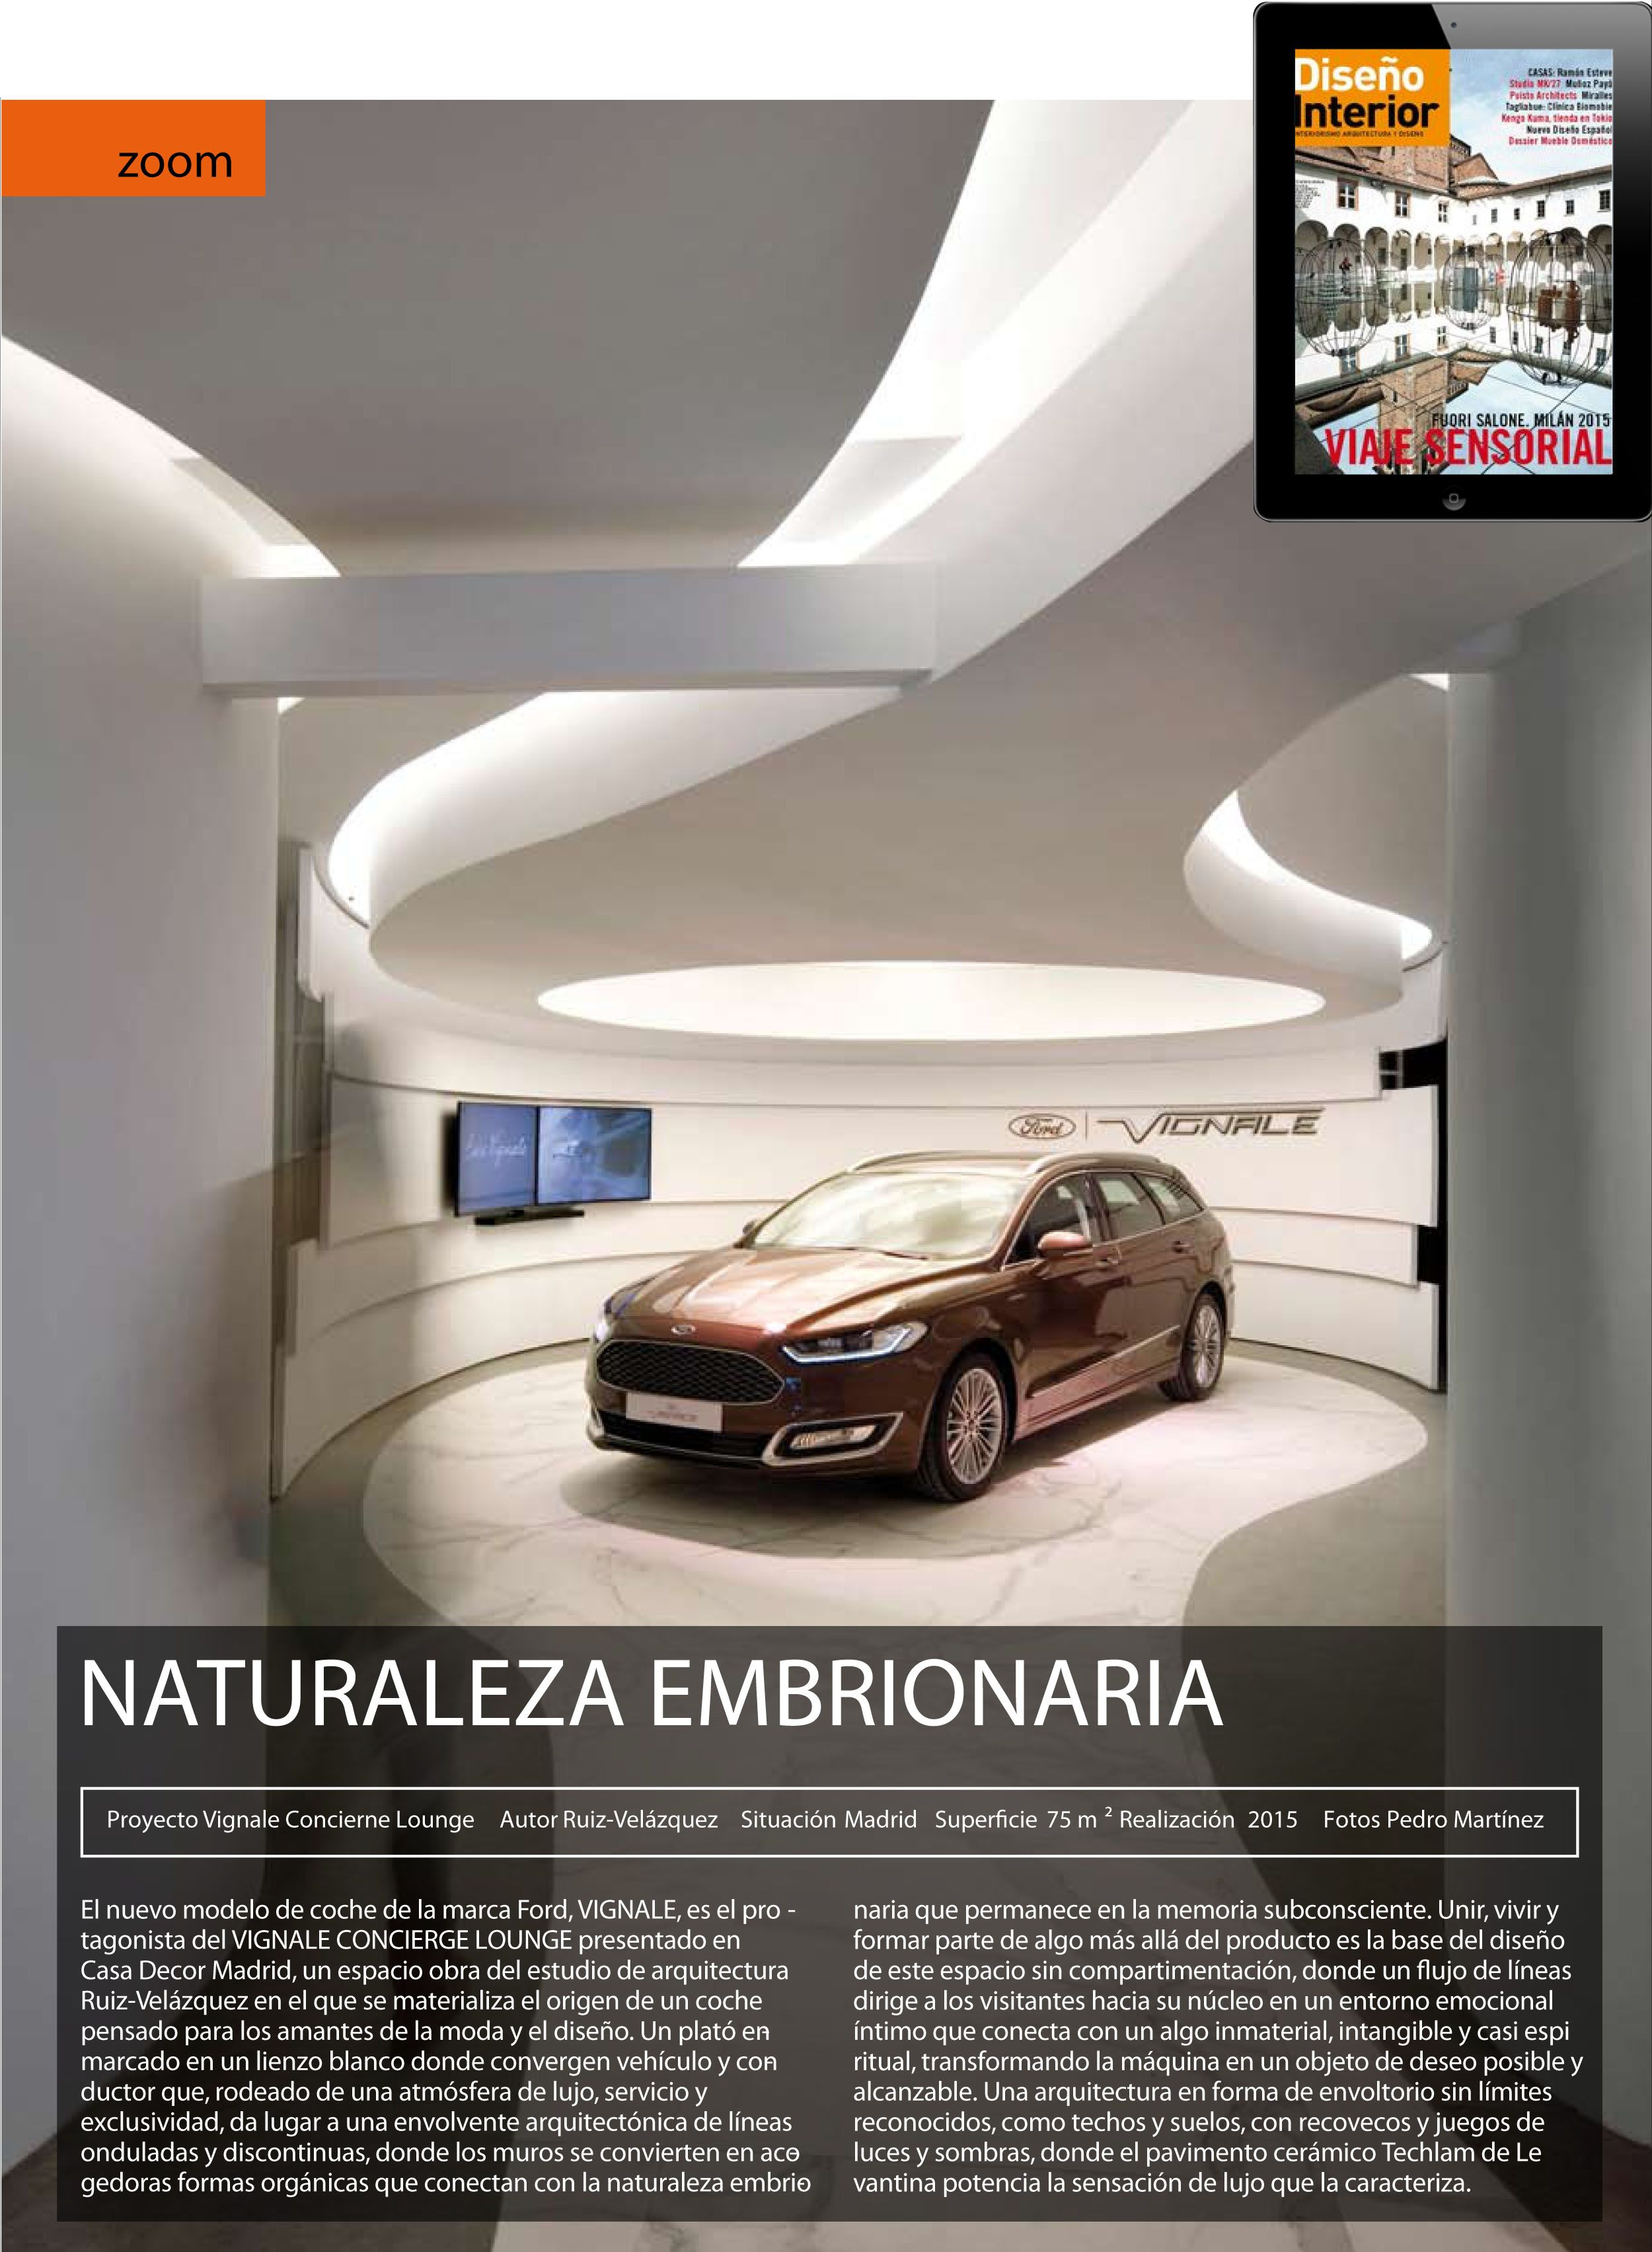 Ford Vignale Lounge Hector Ruiz Velazquez Ruiz Lounge Y Ford